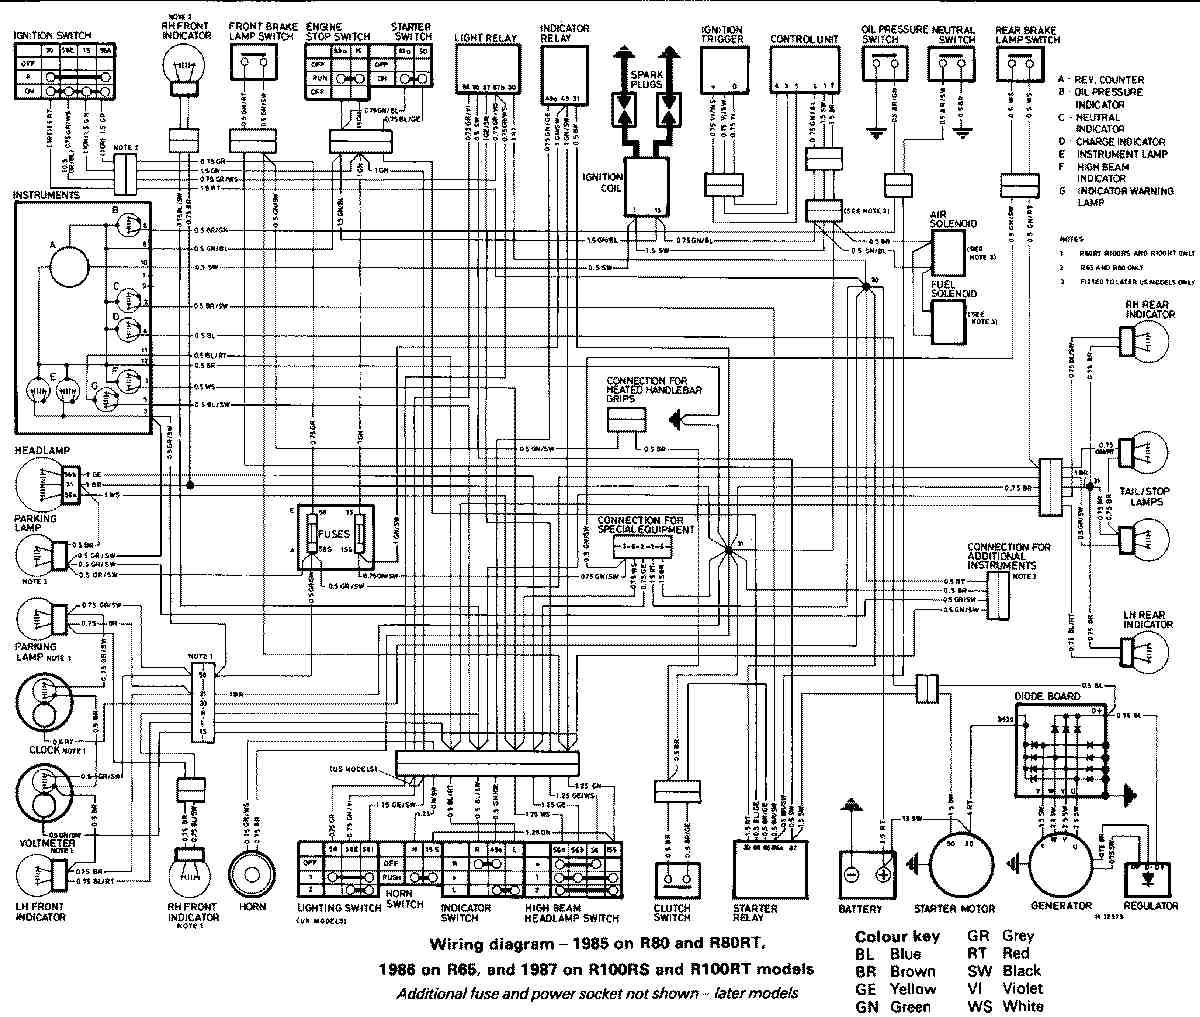 2002 bmw factory wiring diagrams willys cj wiring diagram 4.7l, Wiring diagram